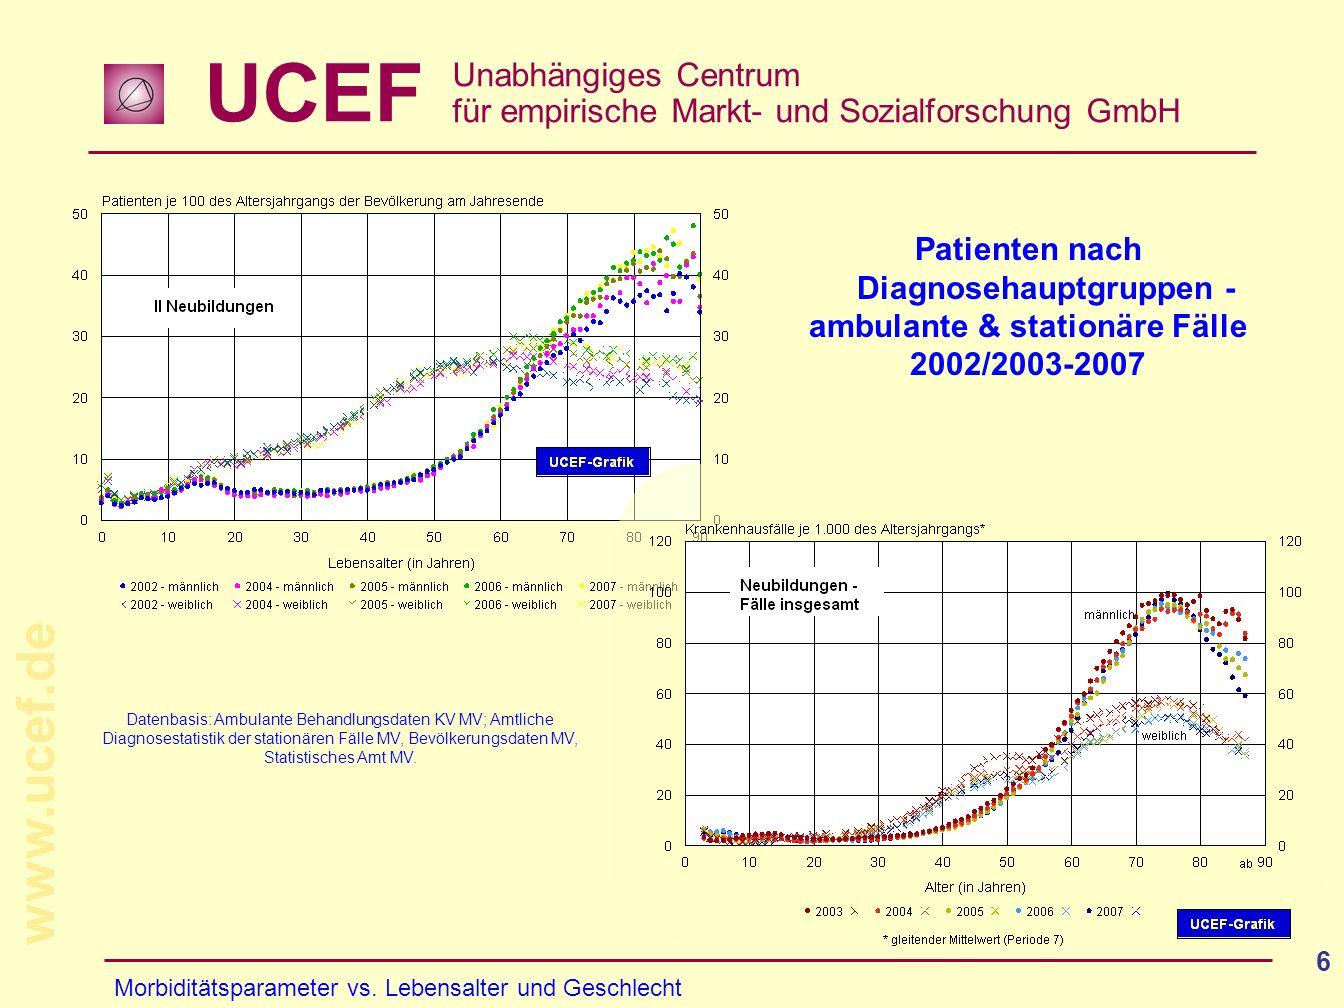 Patienten nach Diagnosehauptgruppen - ambulante & stationäre Fälle